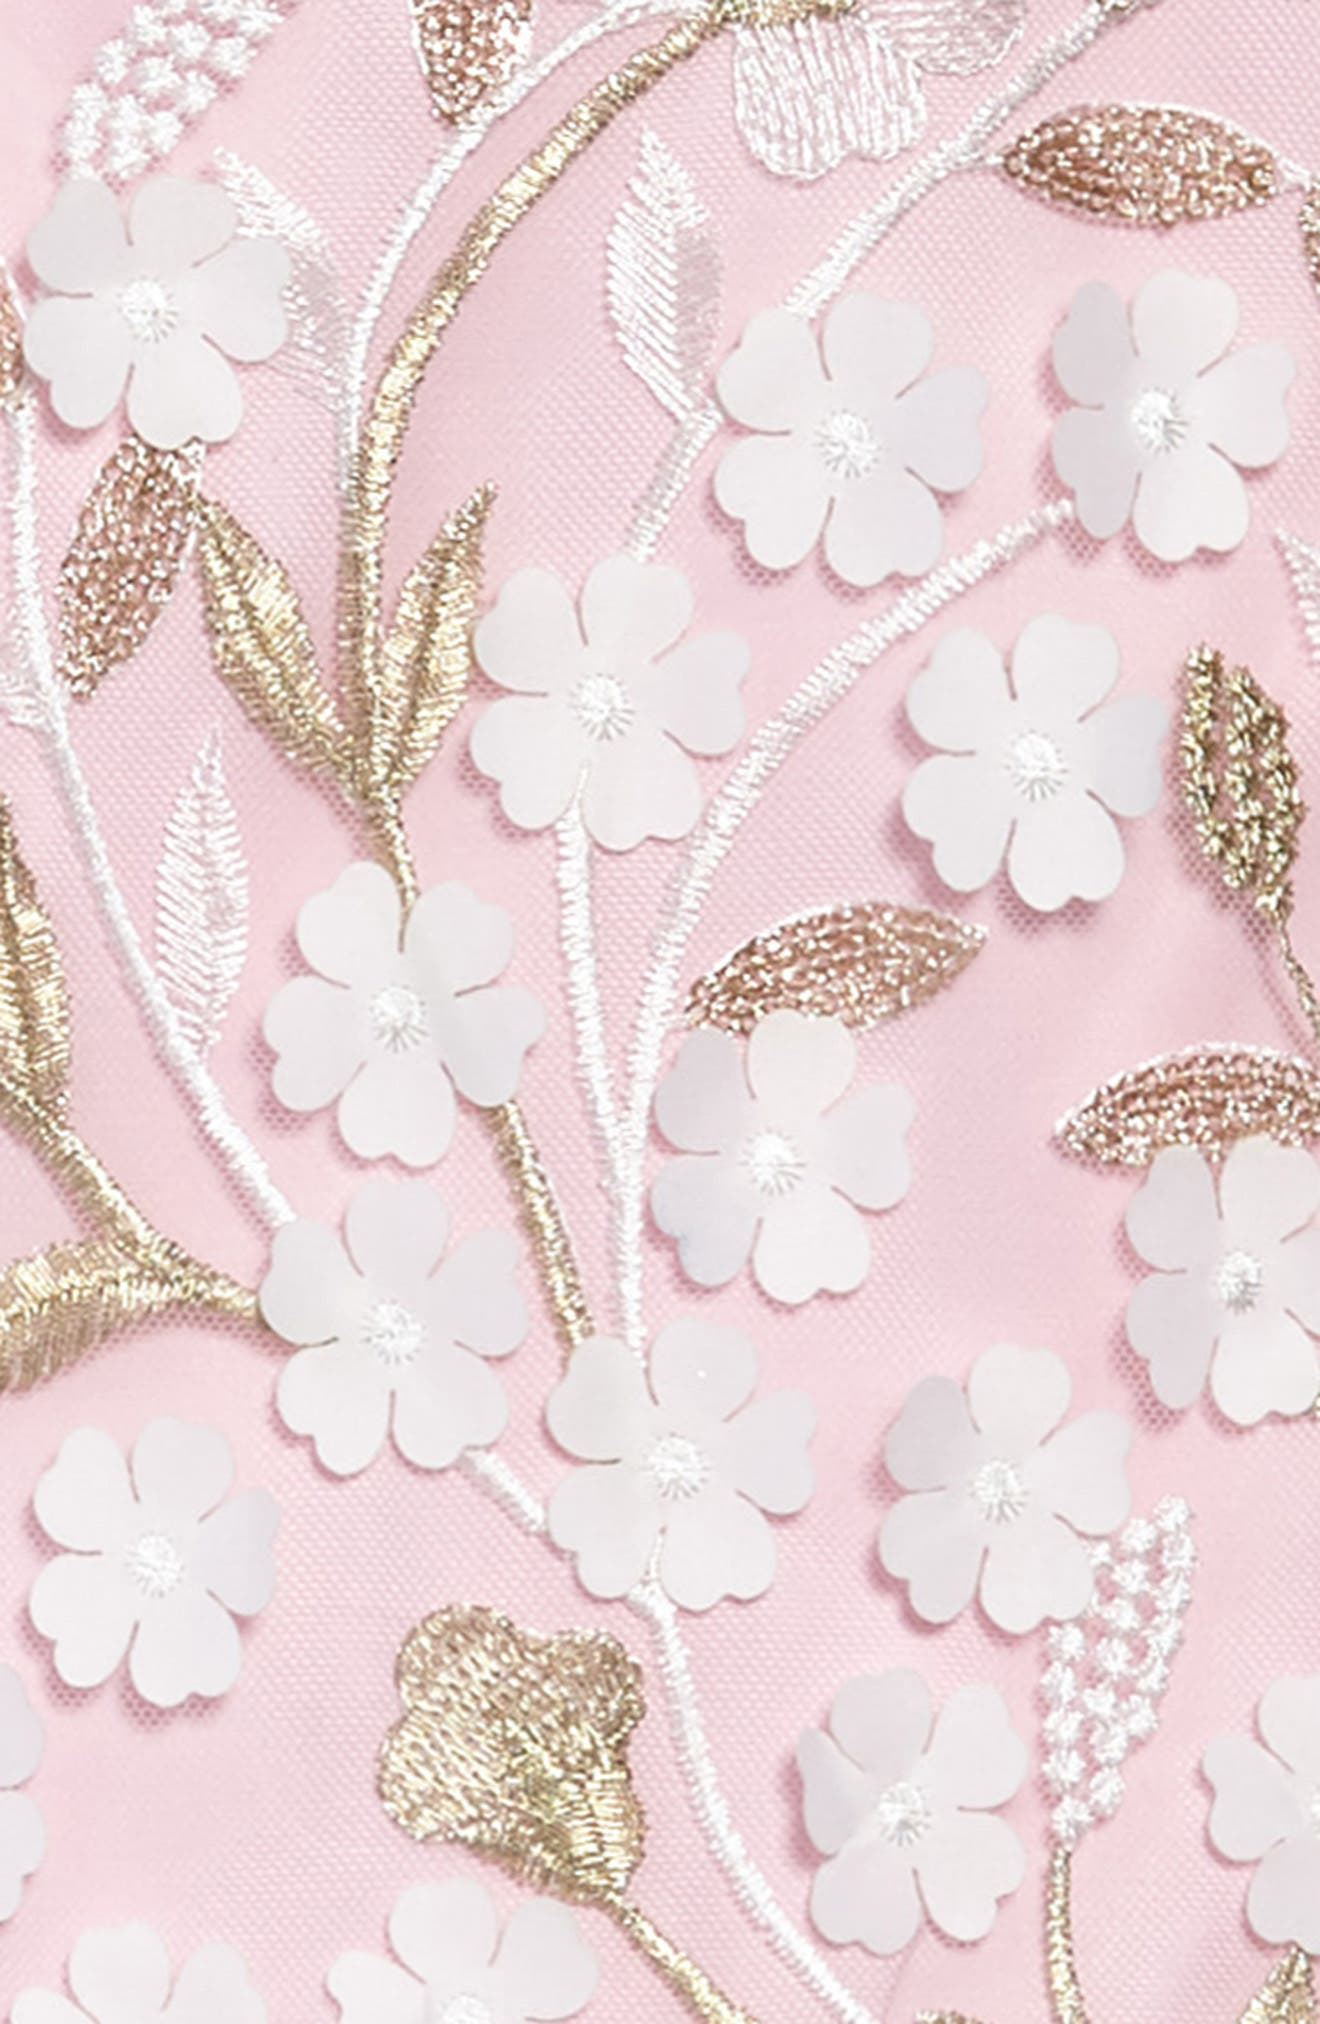 Floral Drop Waist Dress,                             Alternate thumbnail 3, color,                             Pink